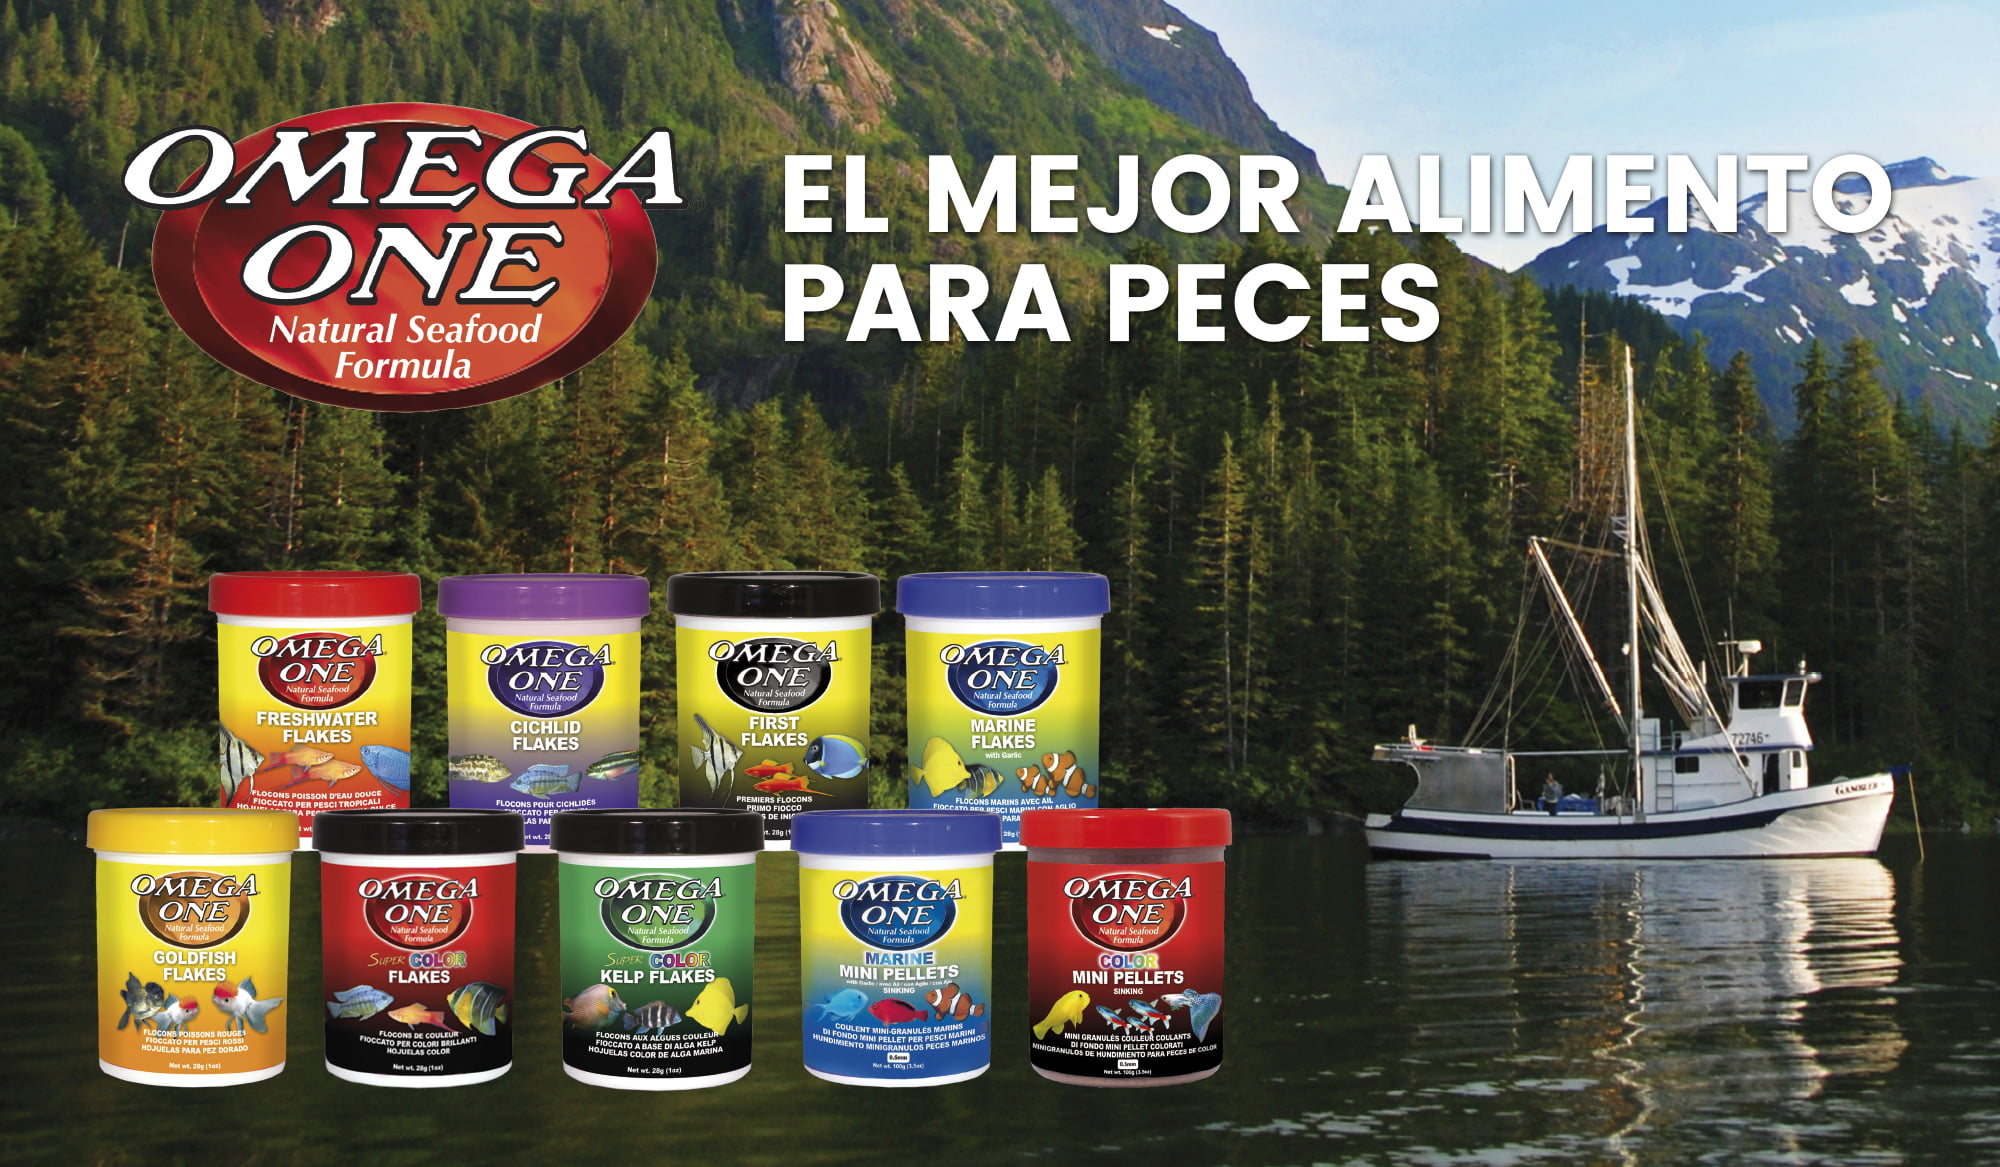 Omega One: Alimento natural premium para peces